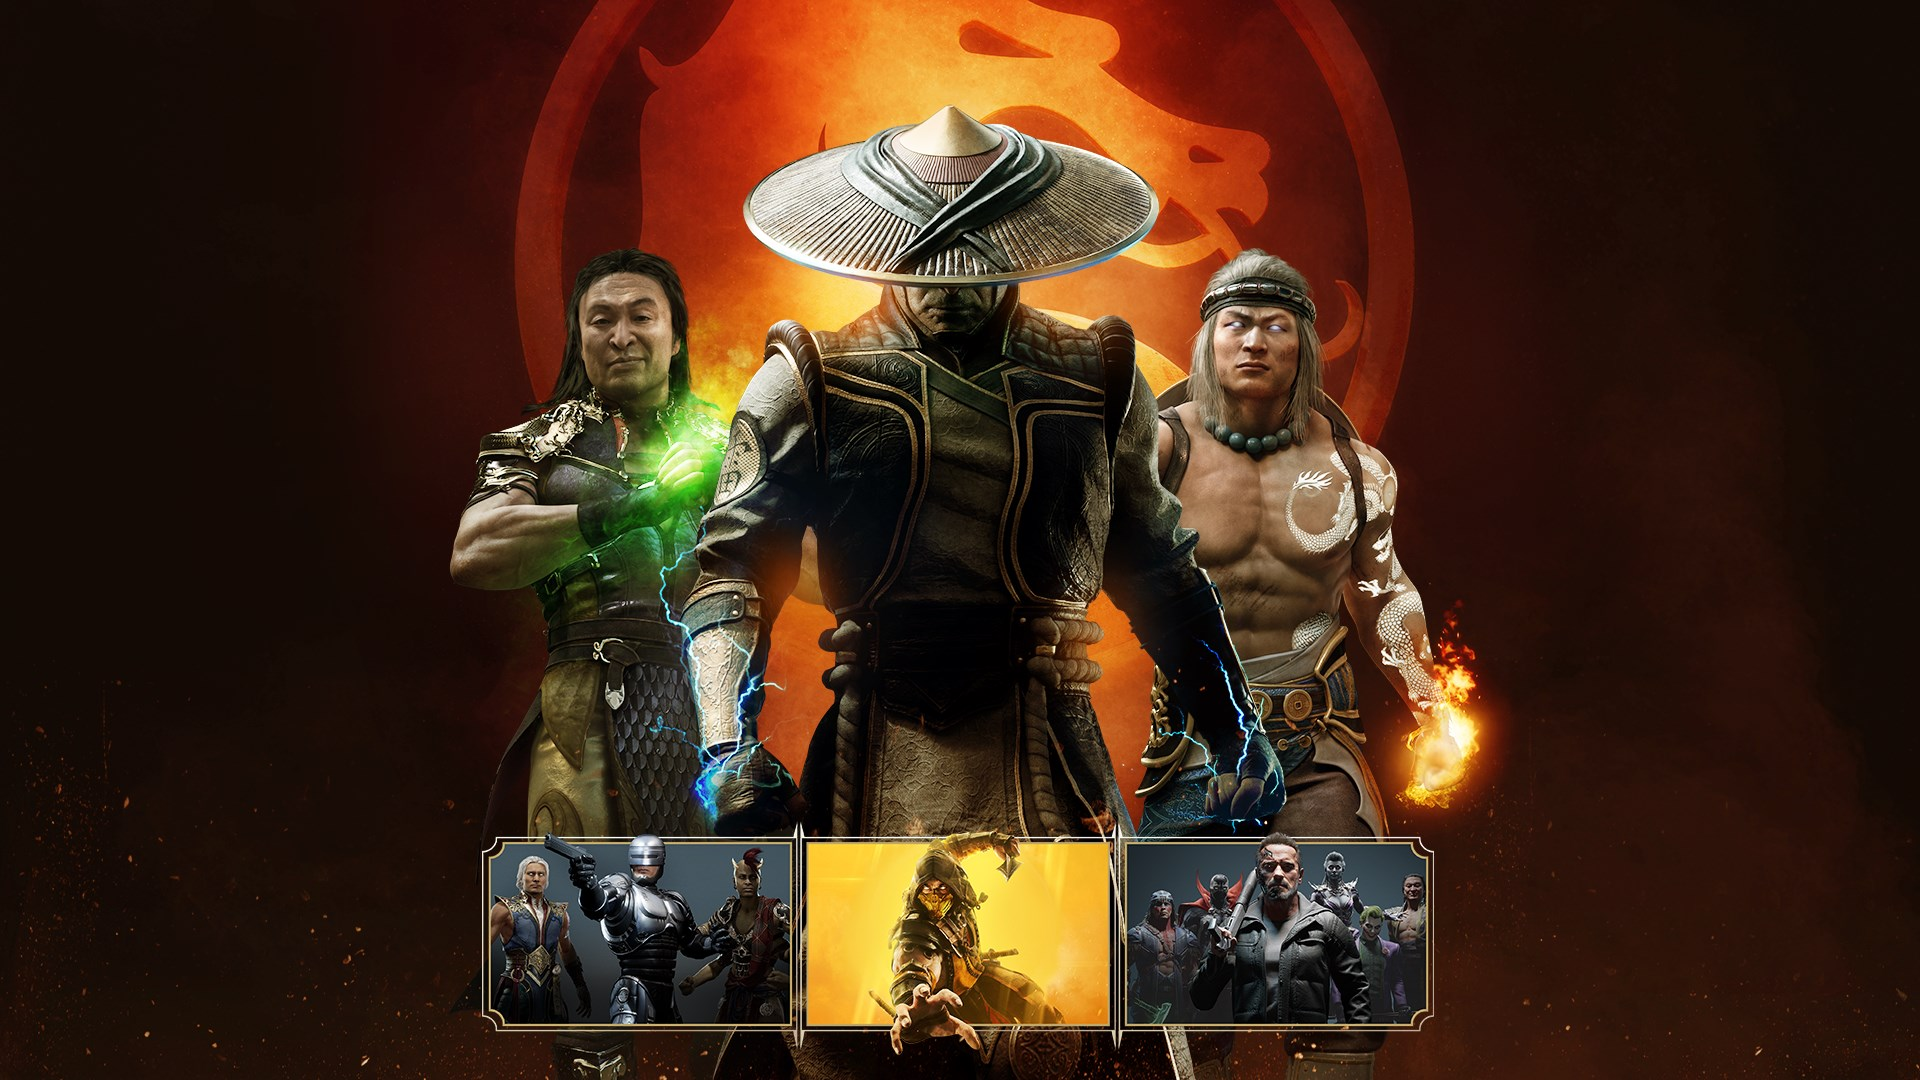 imagen de Mortal Kombat 11 Aftermath